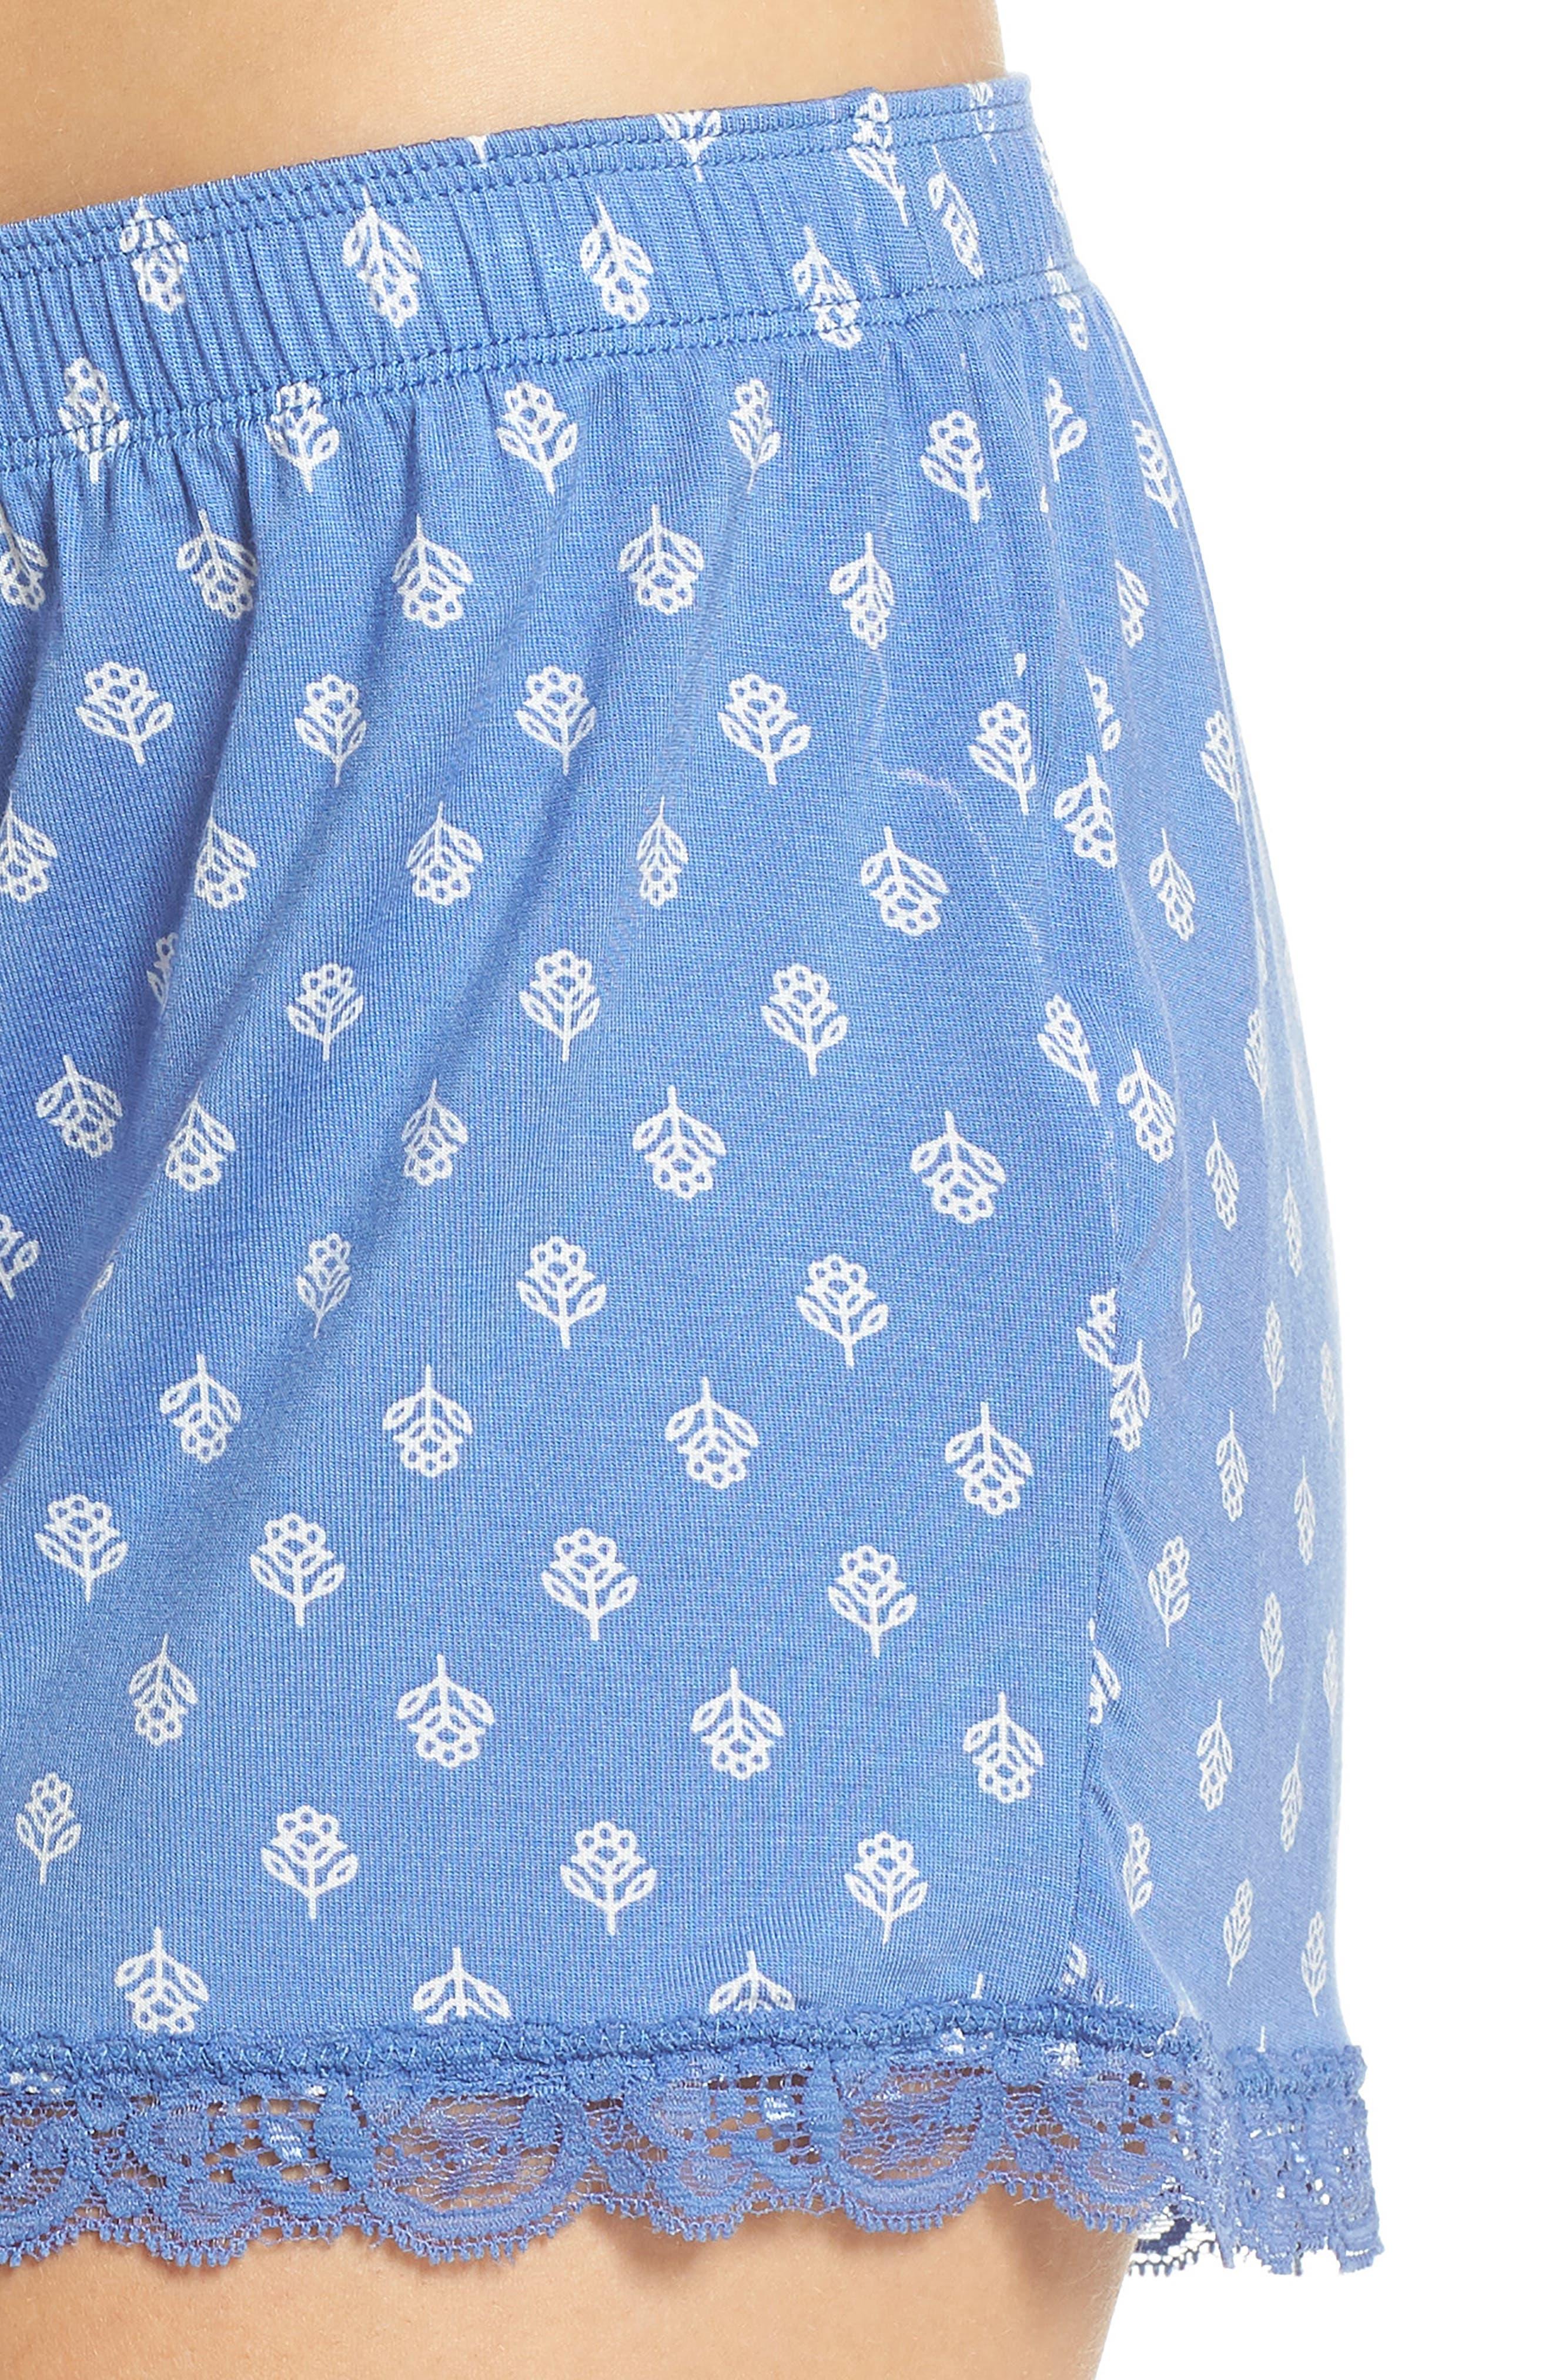 Pajama Shorts,                             Alternate thumbnail 6, color,                             Blue